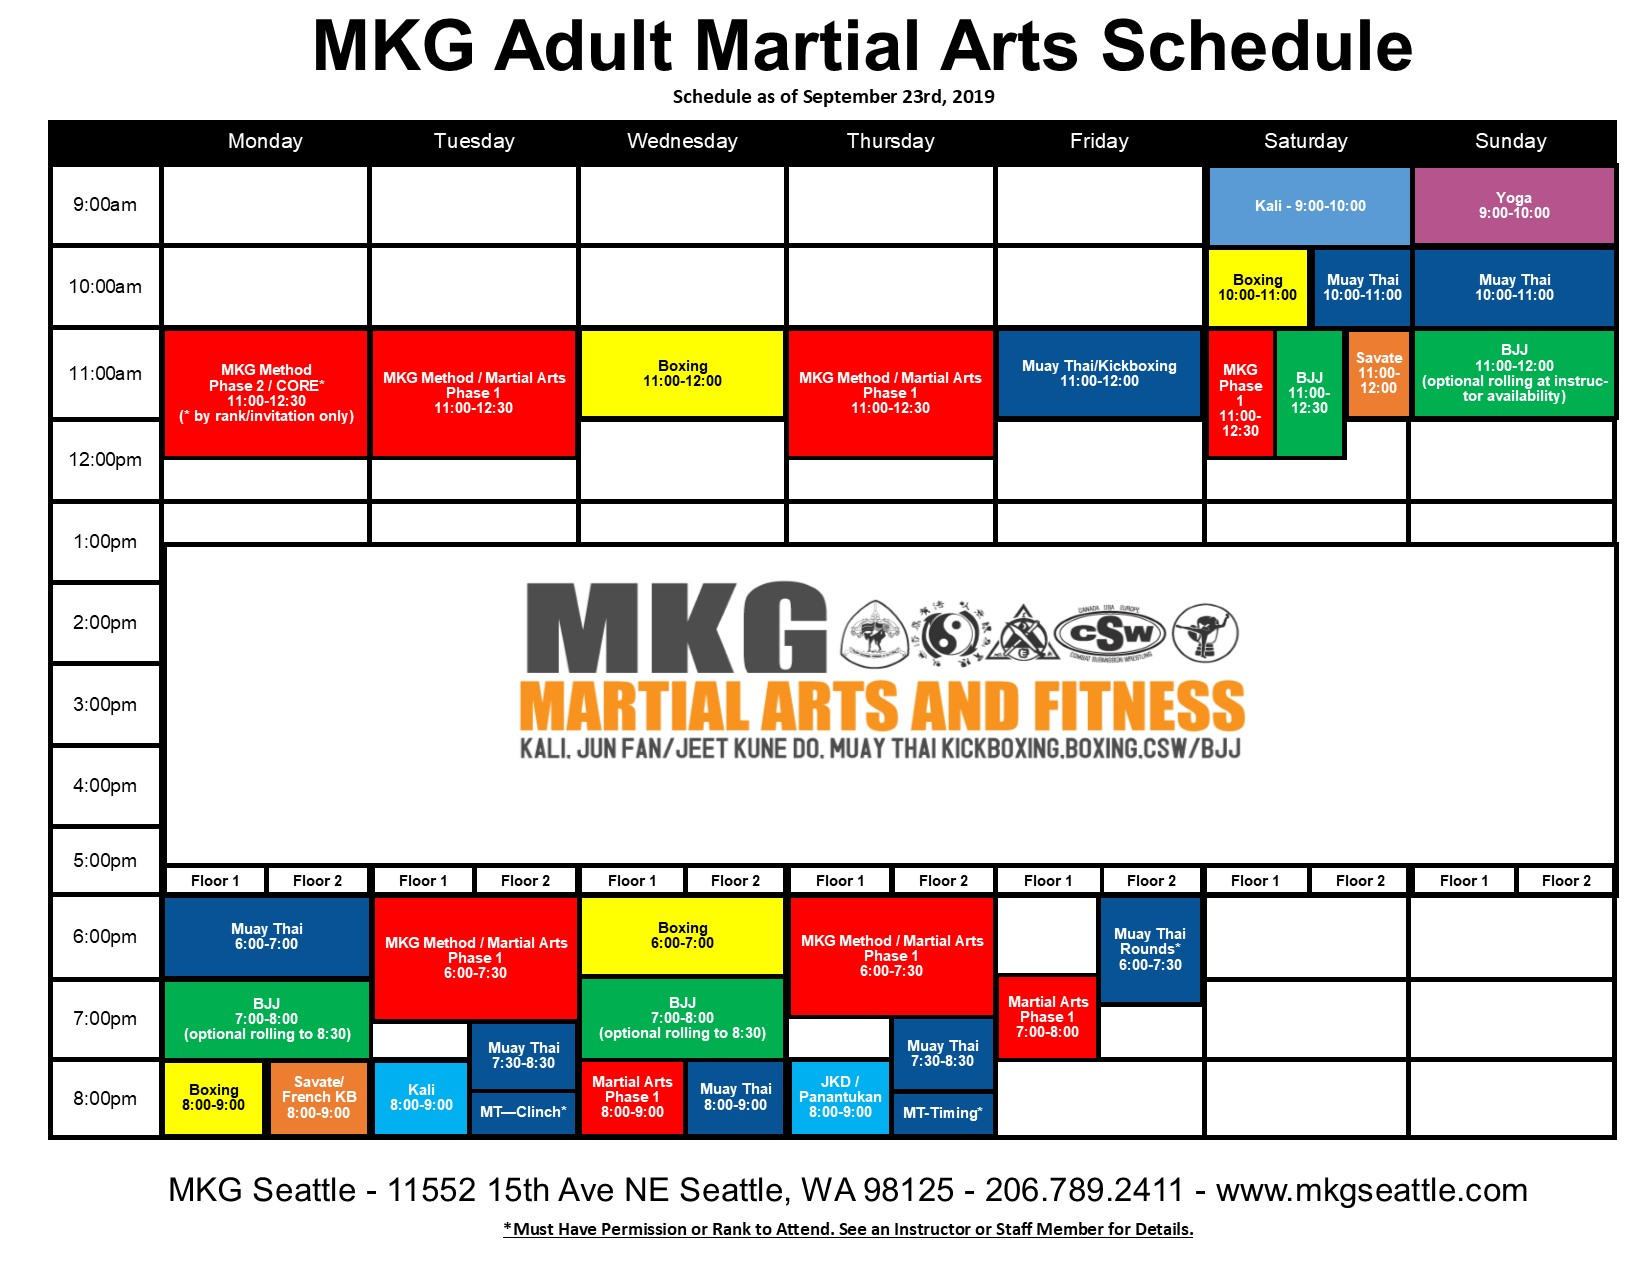 MKG Seattle Adult Martial Arts Schedule 2019